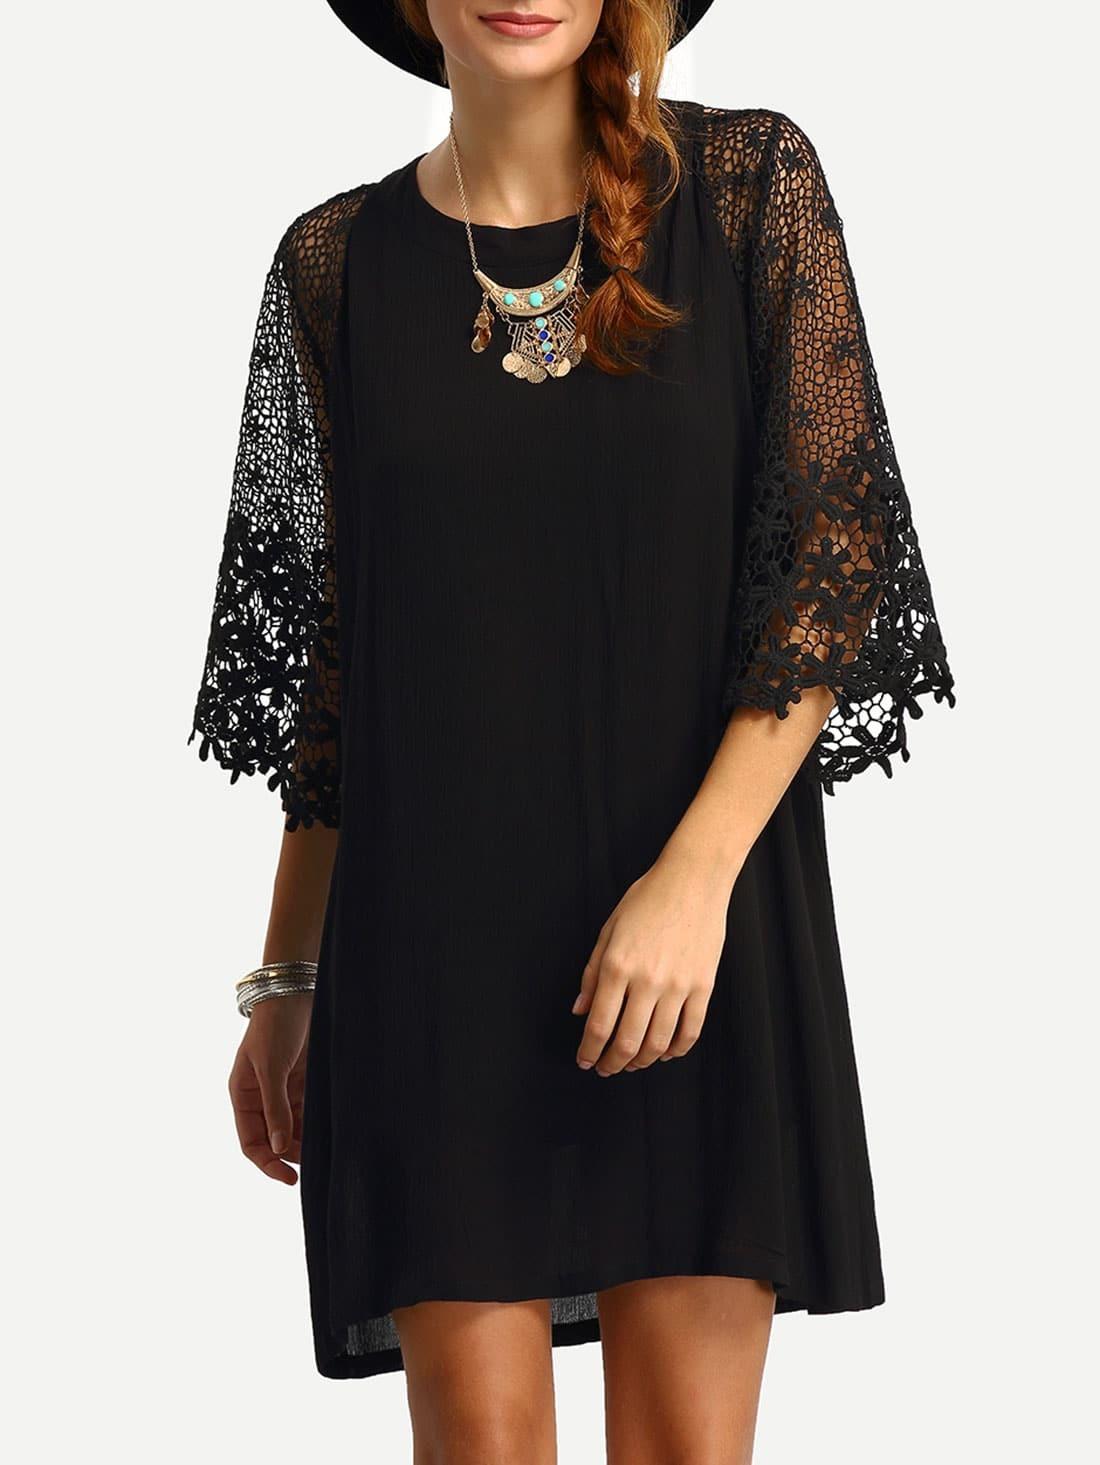 Hollow Out Crochet Sleeve Tunic Dress EmmaCloth-Women Fast Fashion ...